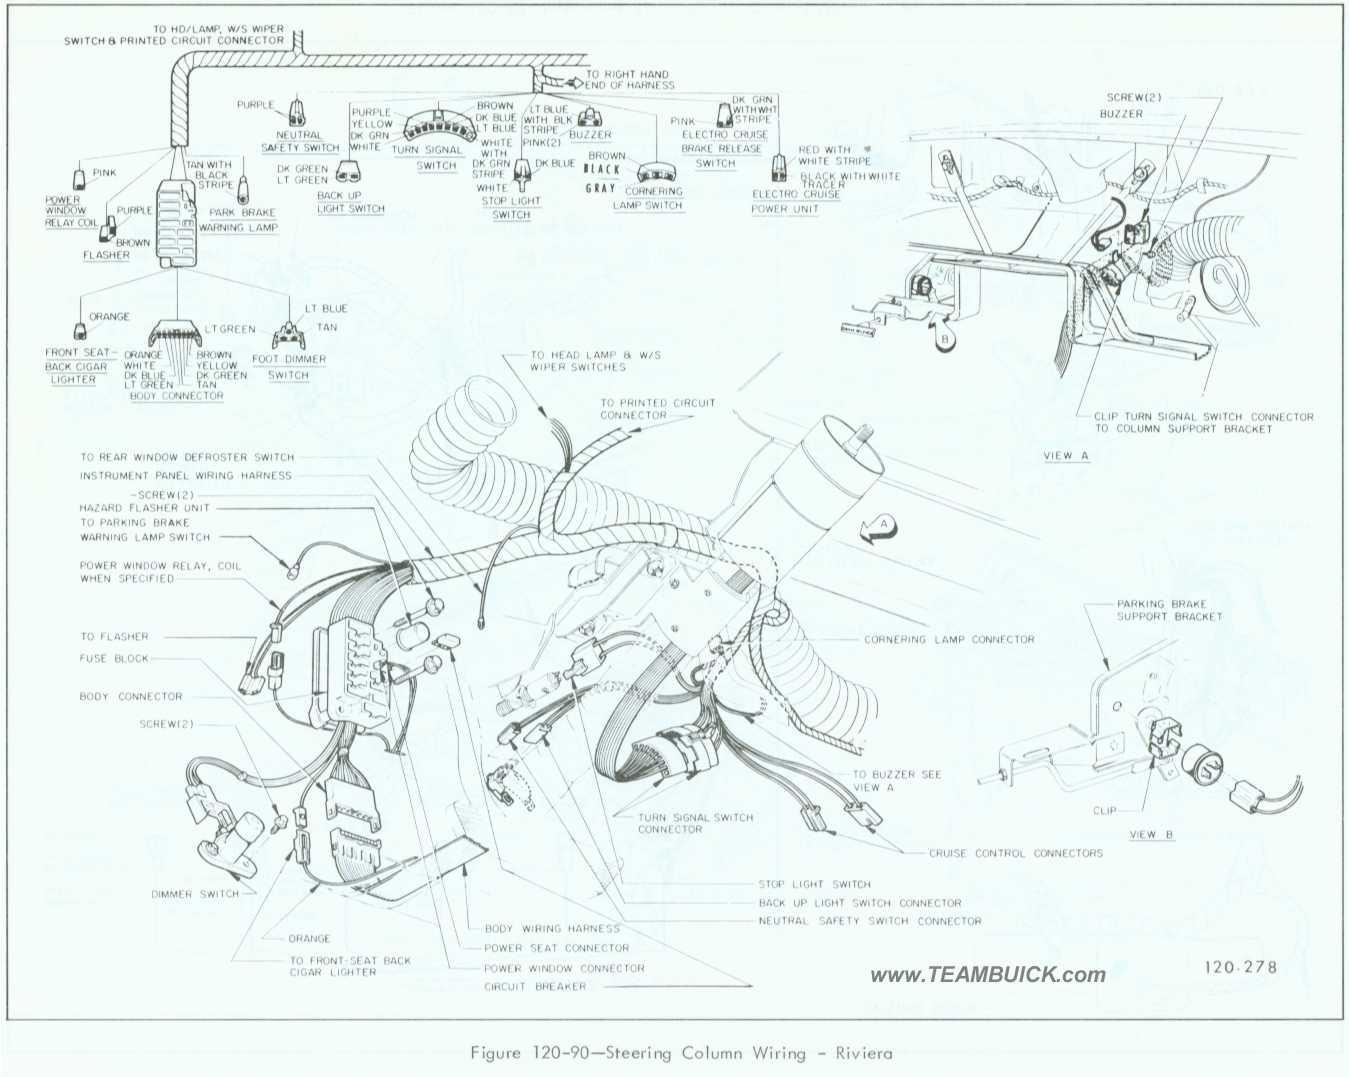 hight resolution of 1964 buick riviera wiring diagrams buick auto wiring diagram 1964 buick riviera 1966 buick wildcat